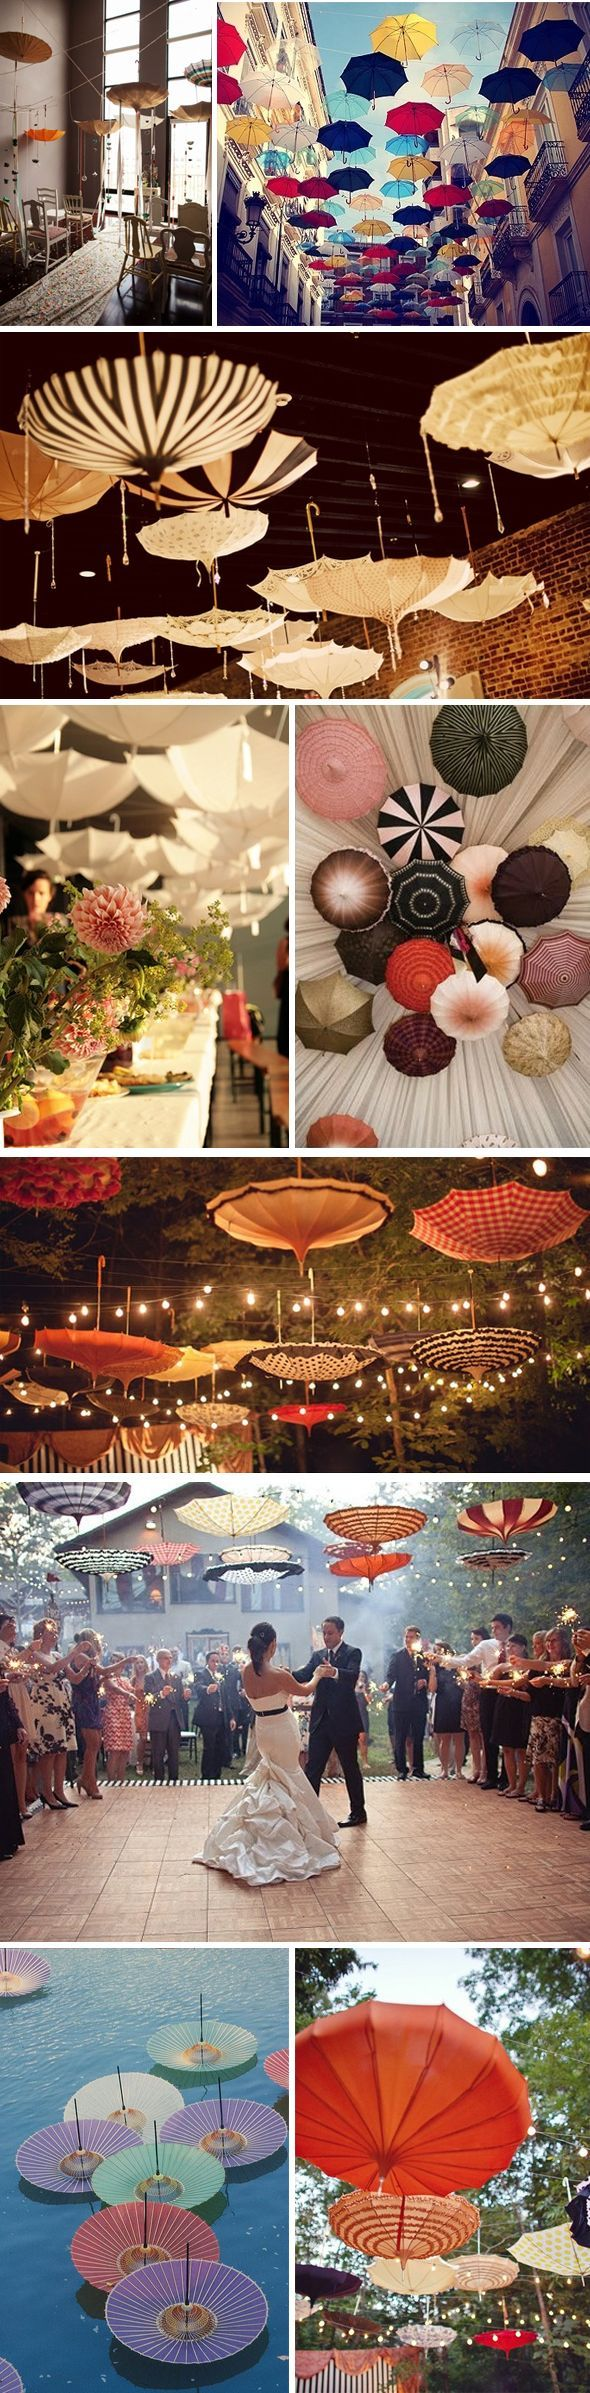 Parapluies & Ombrelles de mariage #Wedding #Decoration -  http://www.mariageenvogue.fr/blog/index/billet/10783_parapluie-ombrelle-mariage